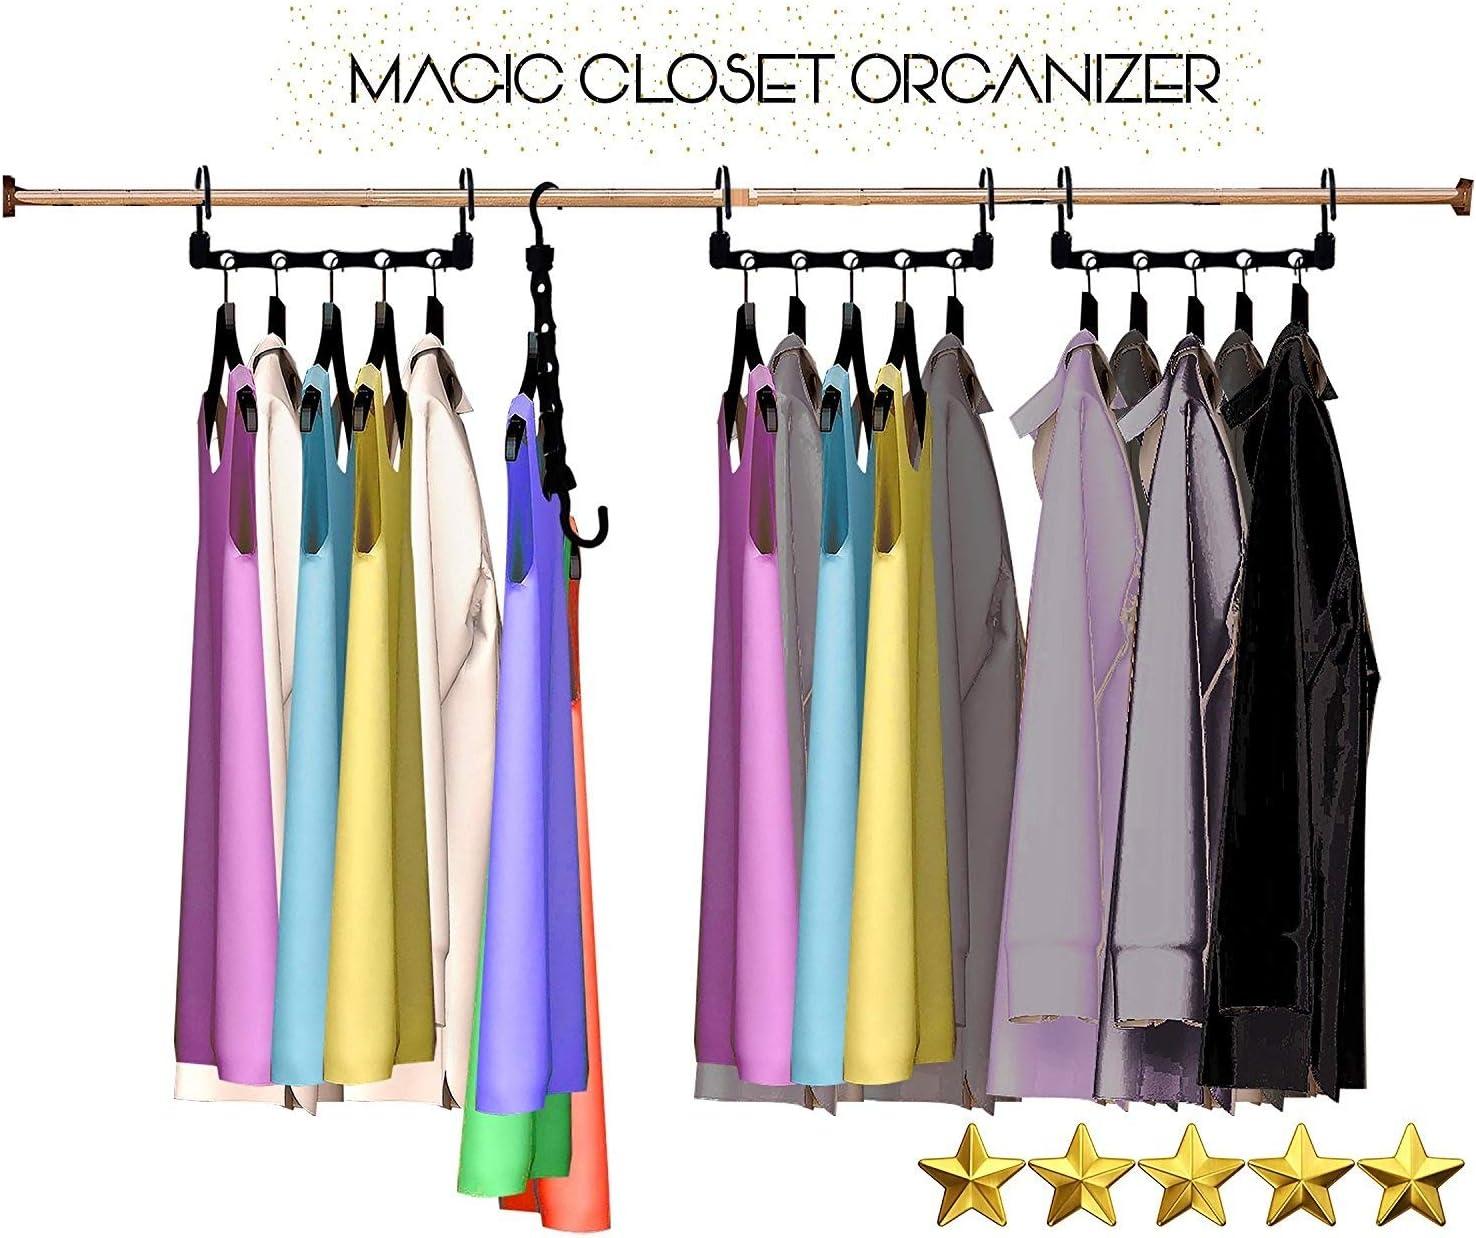 S//10 MAGIC HANGERS Coat Clothing Organizer Space Saver